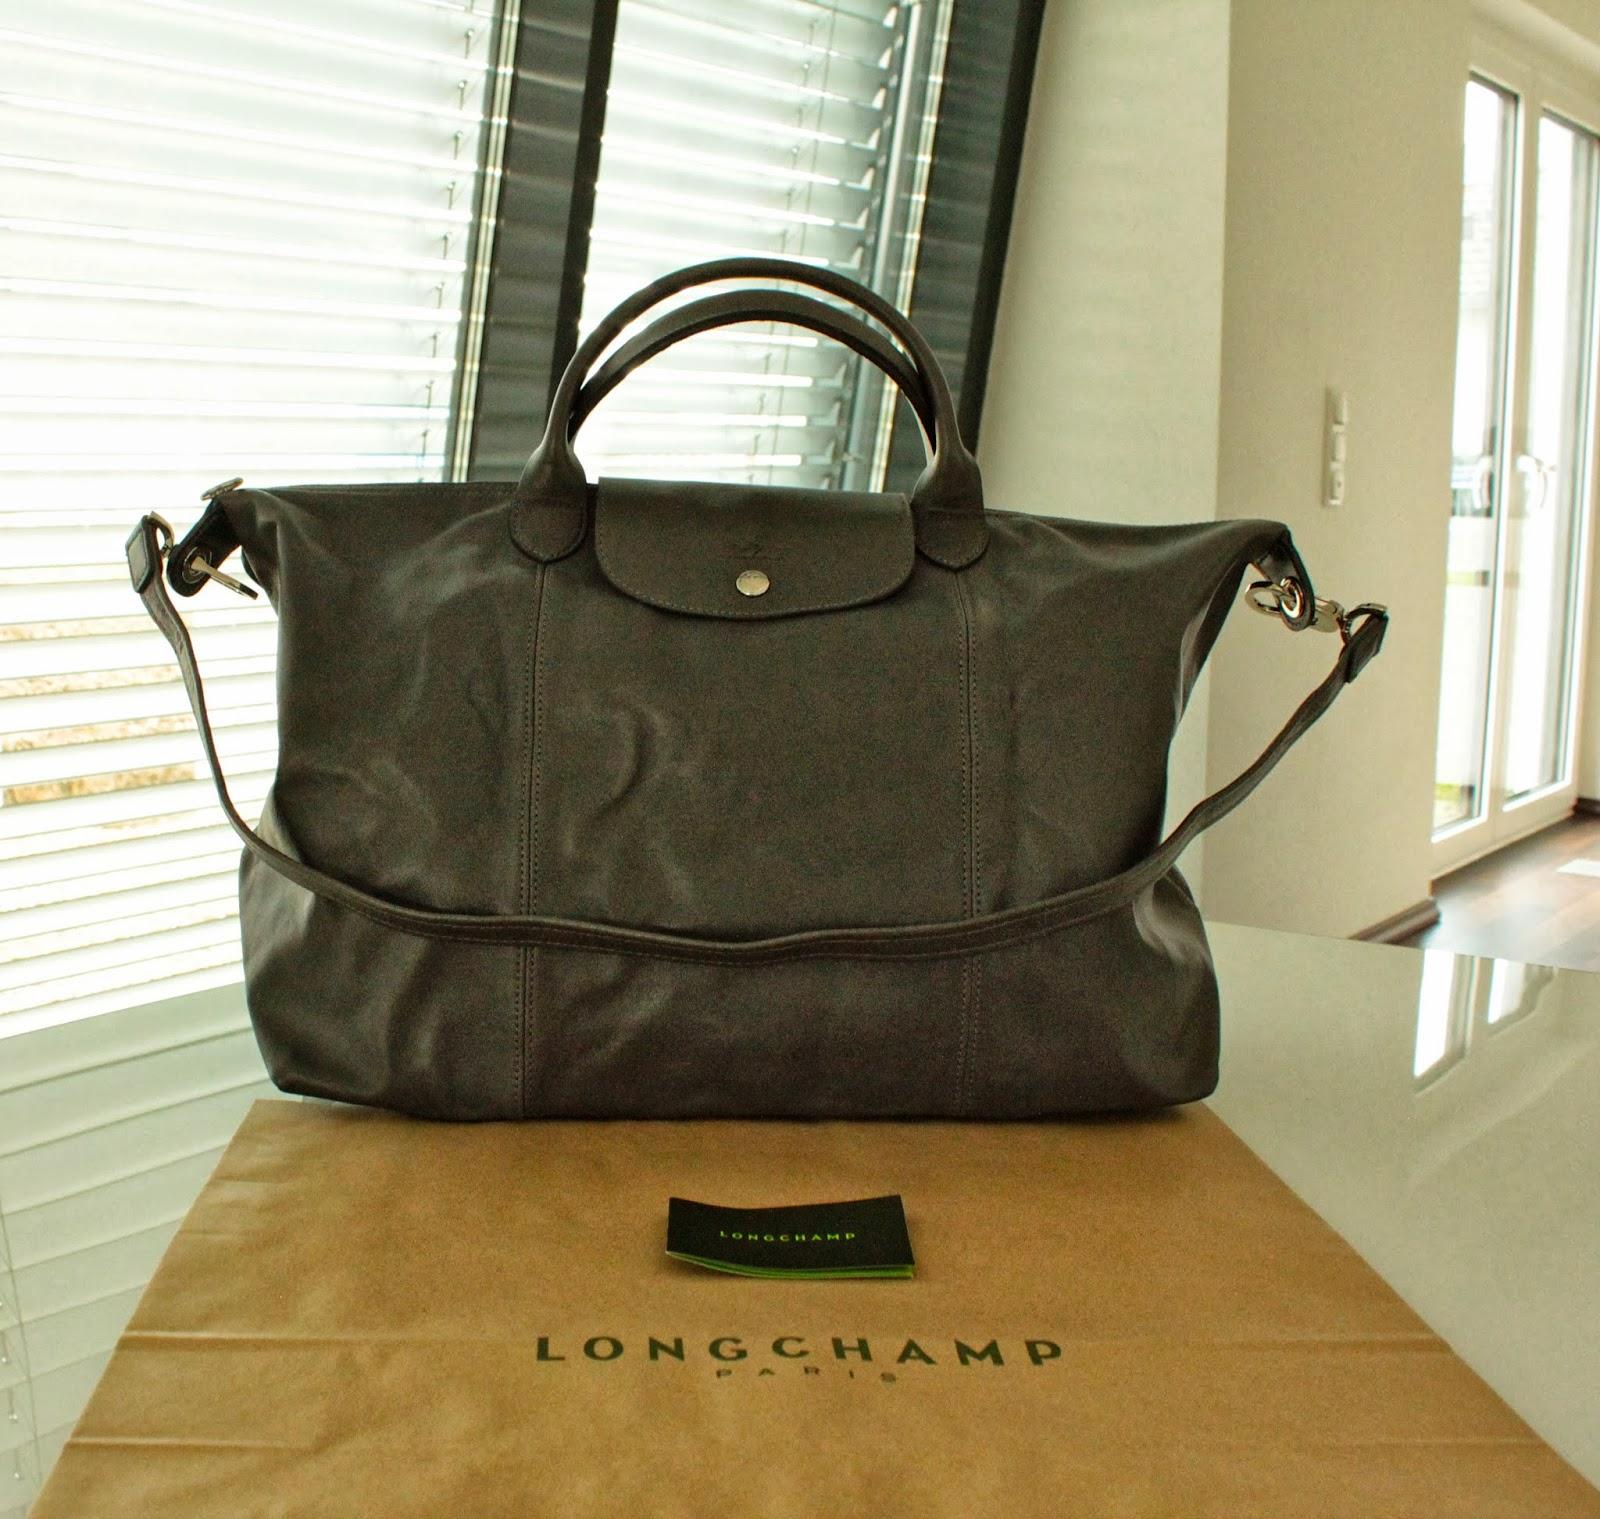 97f2b9f2a868 Brand New Authentic Longchamp Le Pliage Cuir Handbag with Shoulder Strap